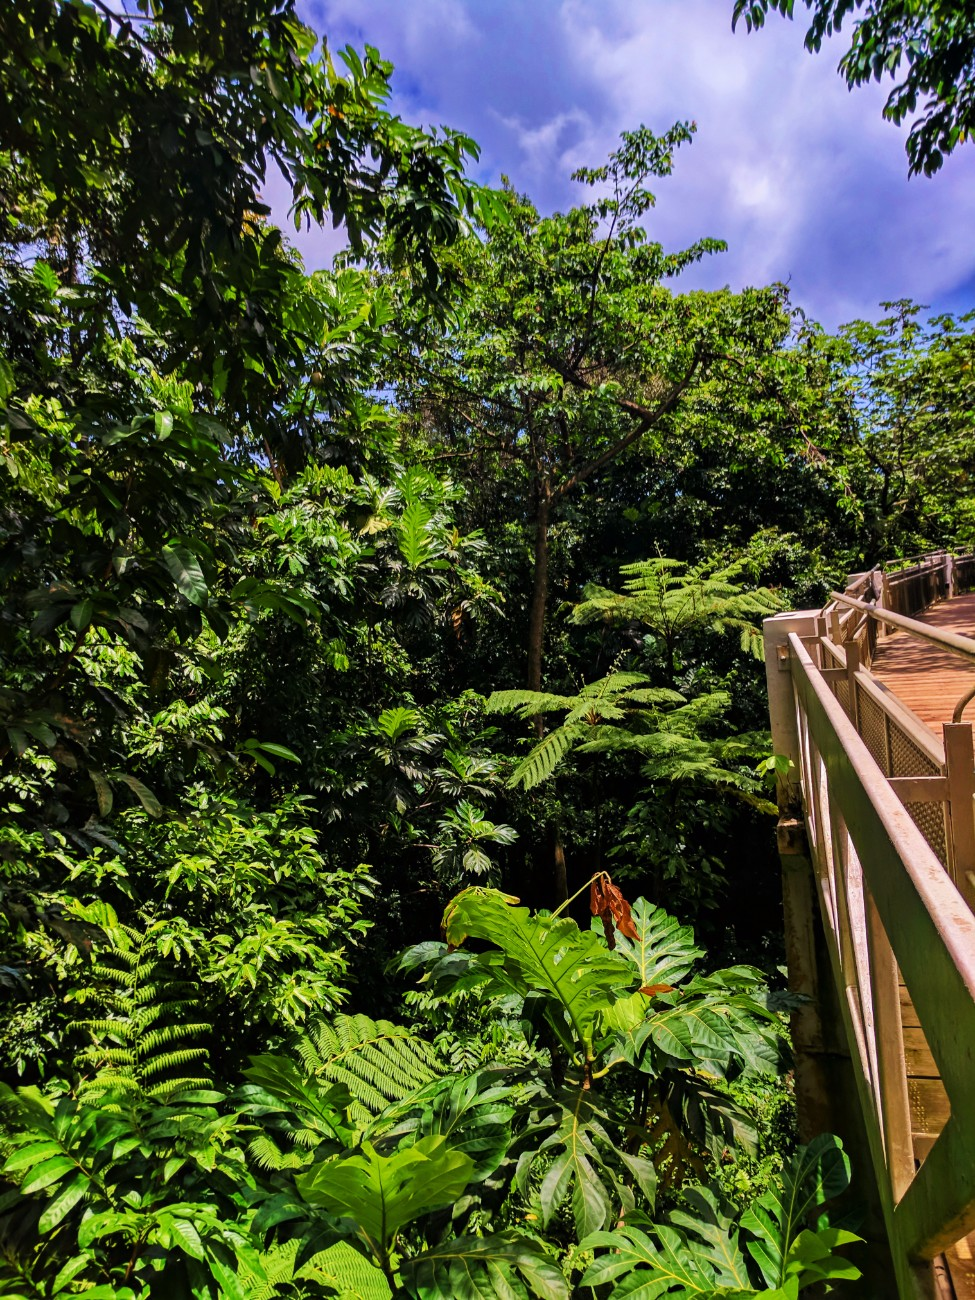 El Portal canopy walk Rainforest El Yunque National Forest Puerto Rico 1